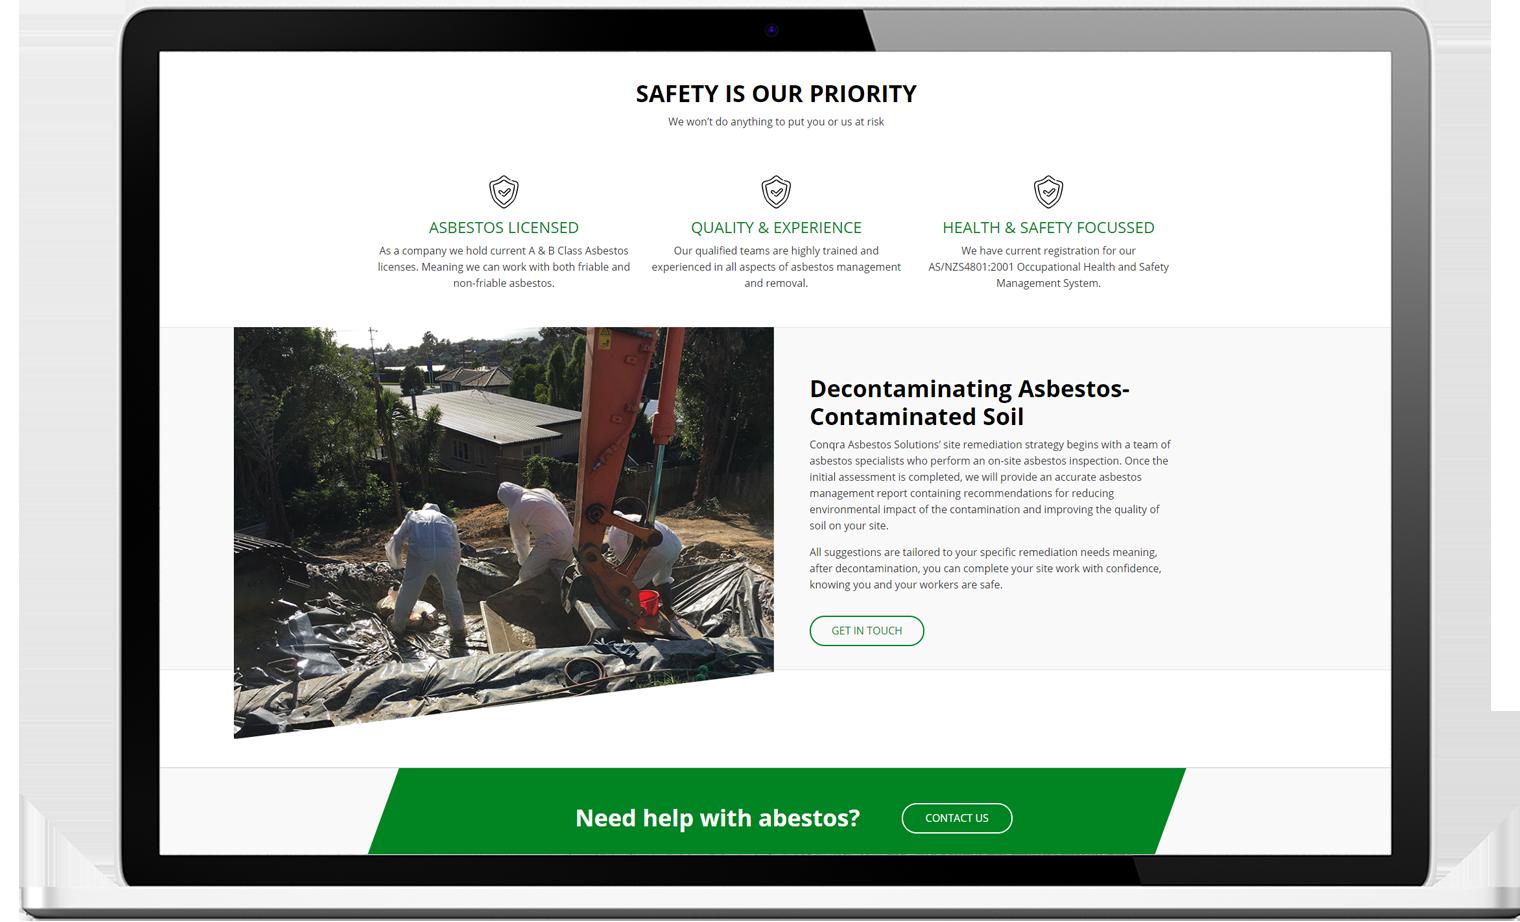 Conqra Website Re design Desktop - Conqra Asbestos Website Design